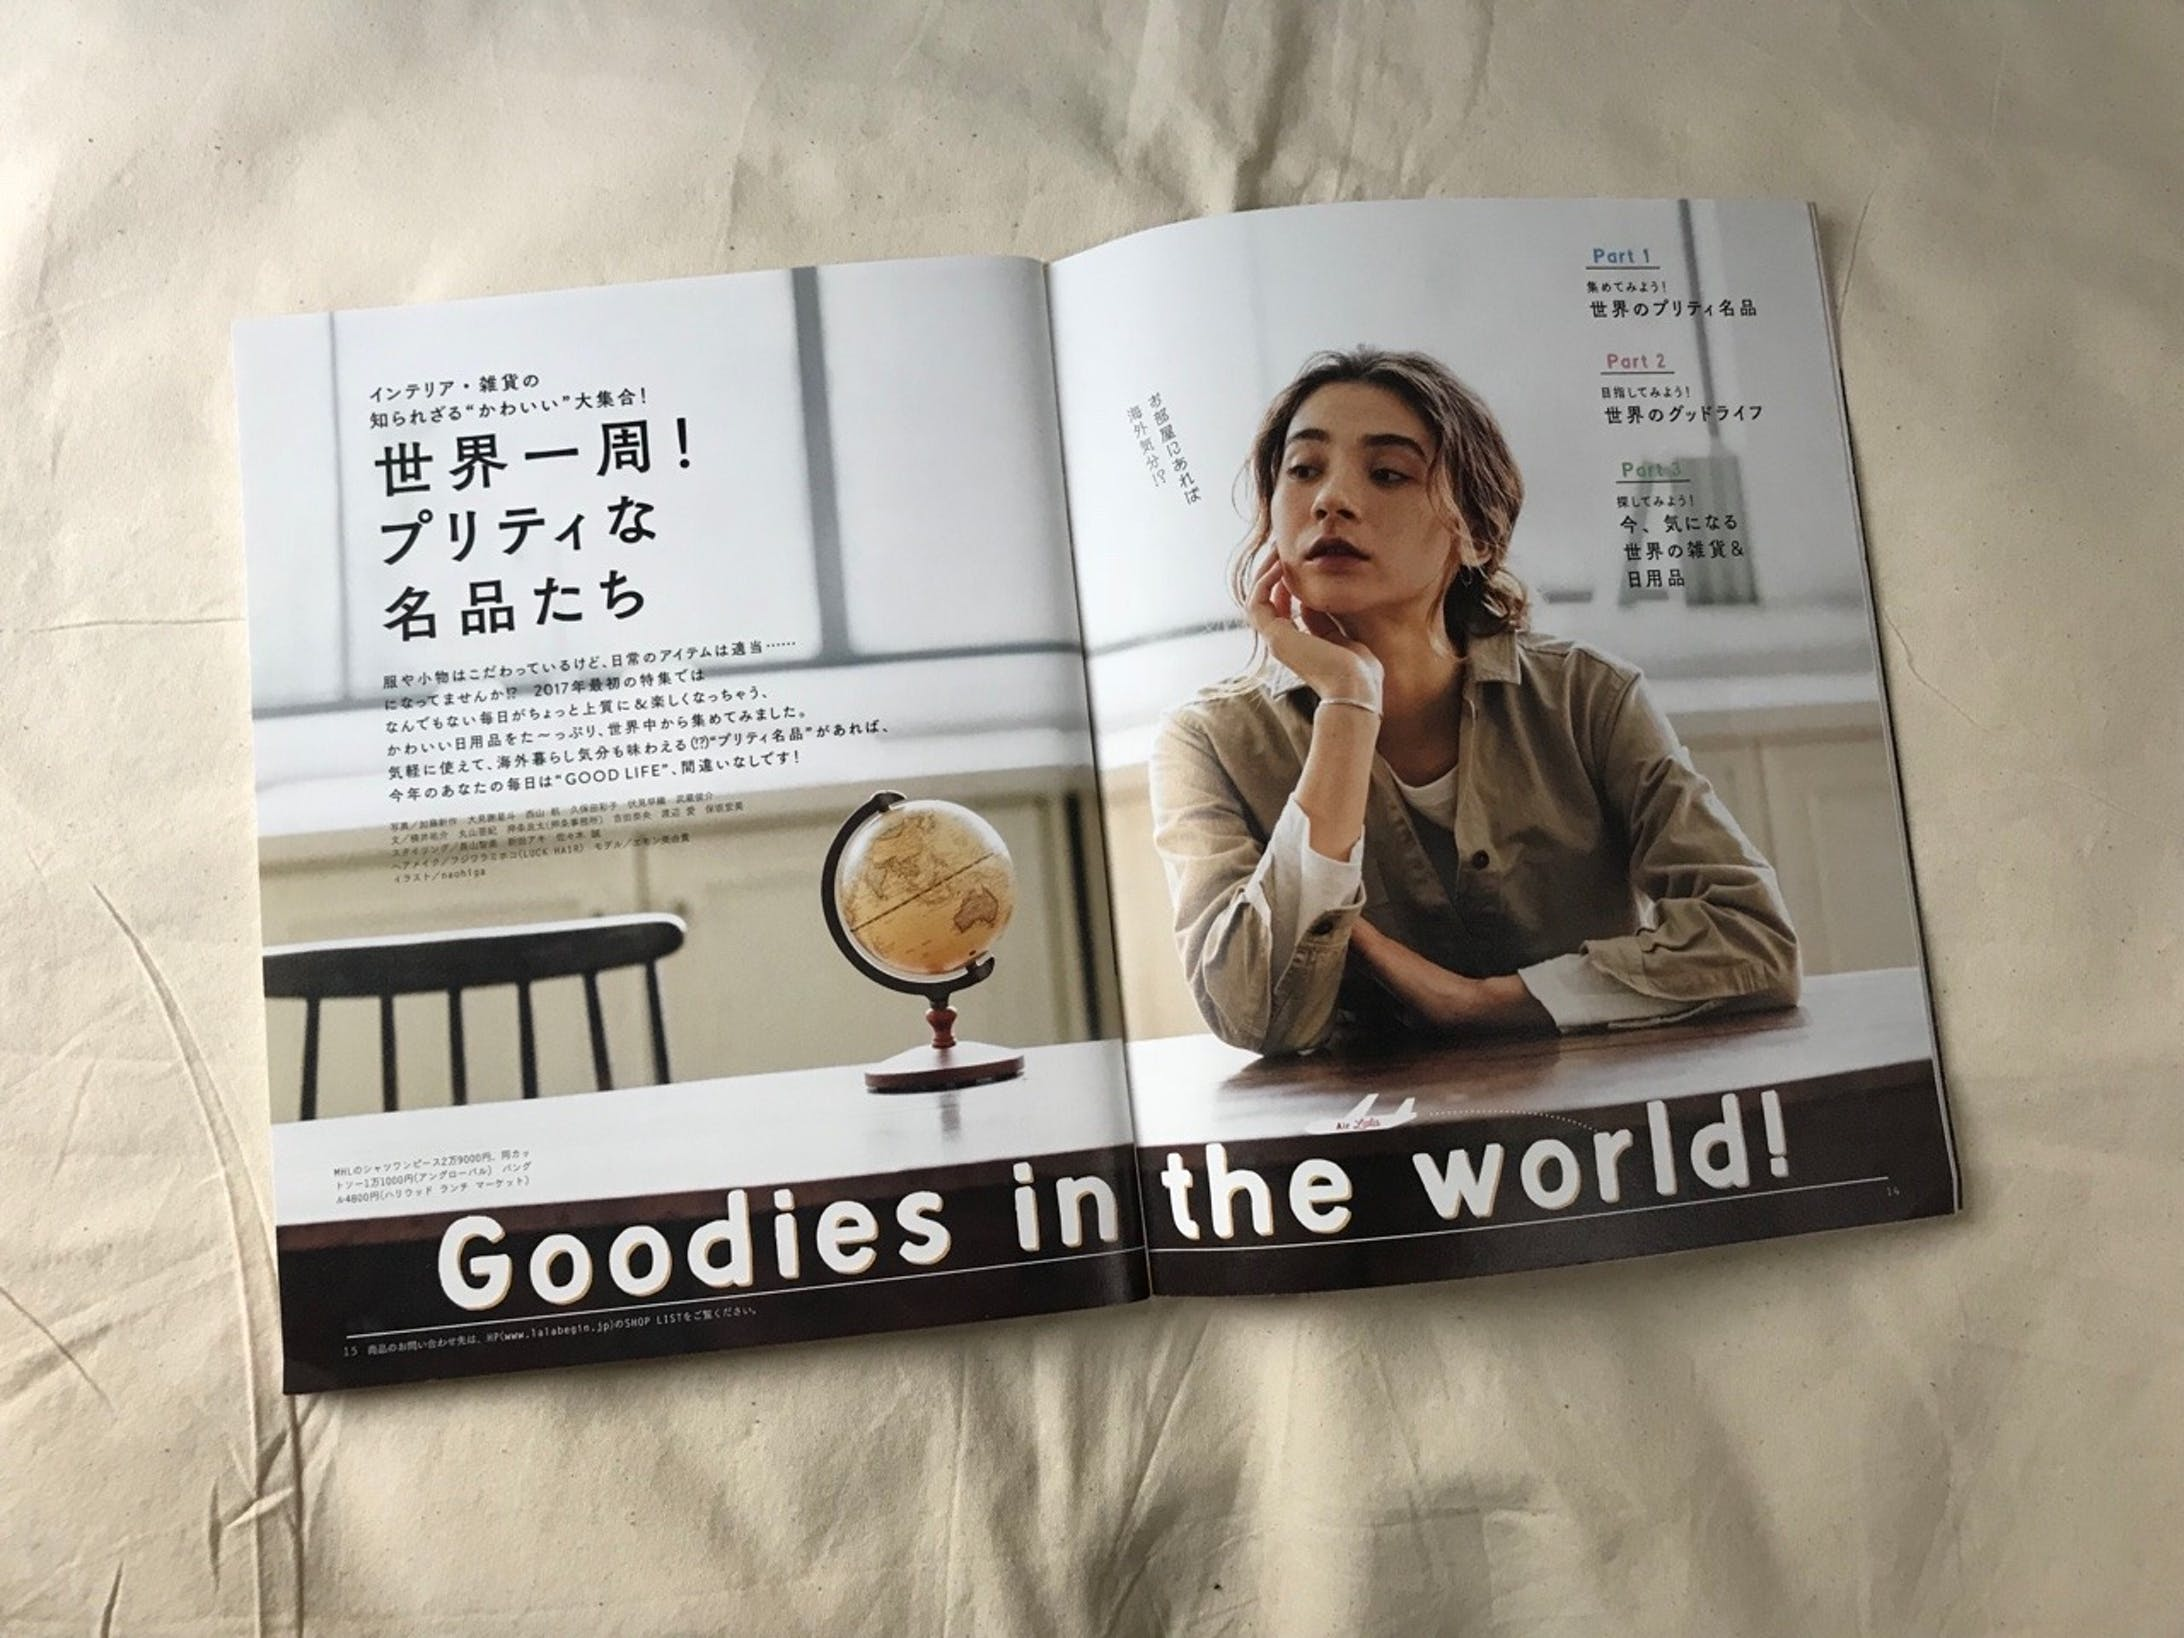 LalaBegin 2017 2.3月号  巻頭 Goodies in the world!特集-2